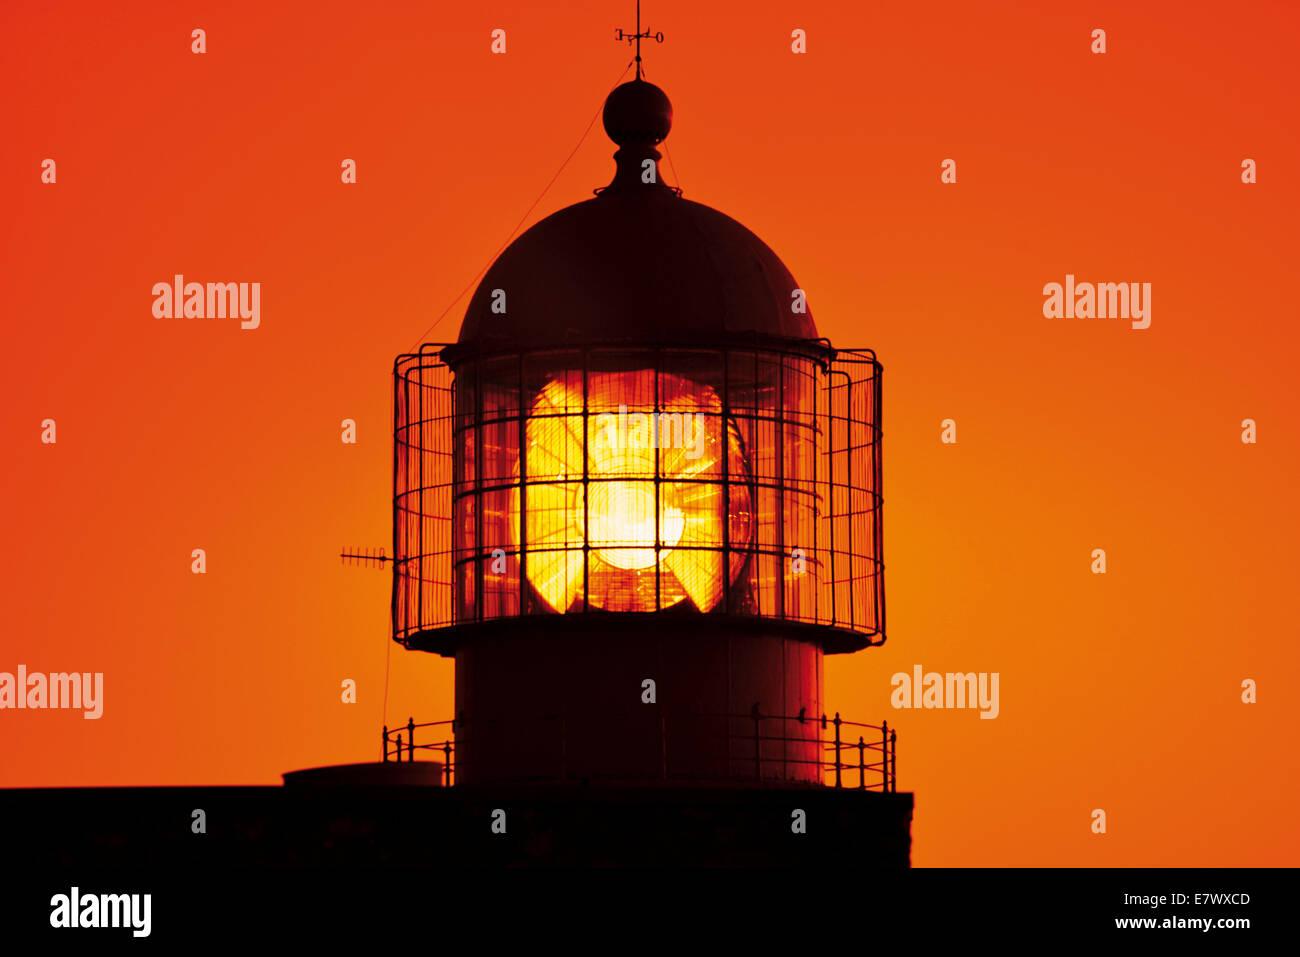 Portugal, Algarve: Sunset at the Lighthouse of Cape Saint Vincent Stock Photo